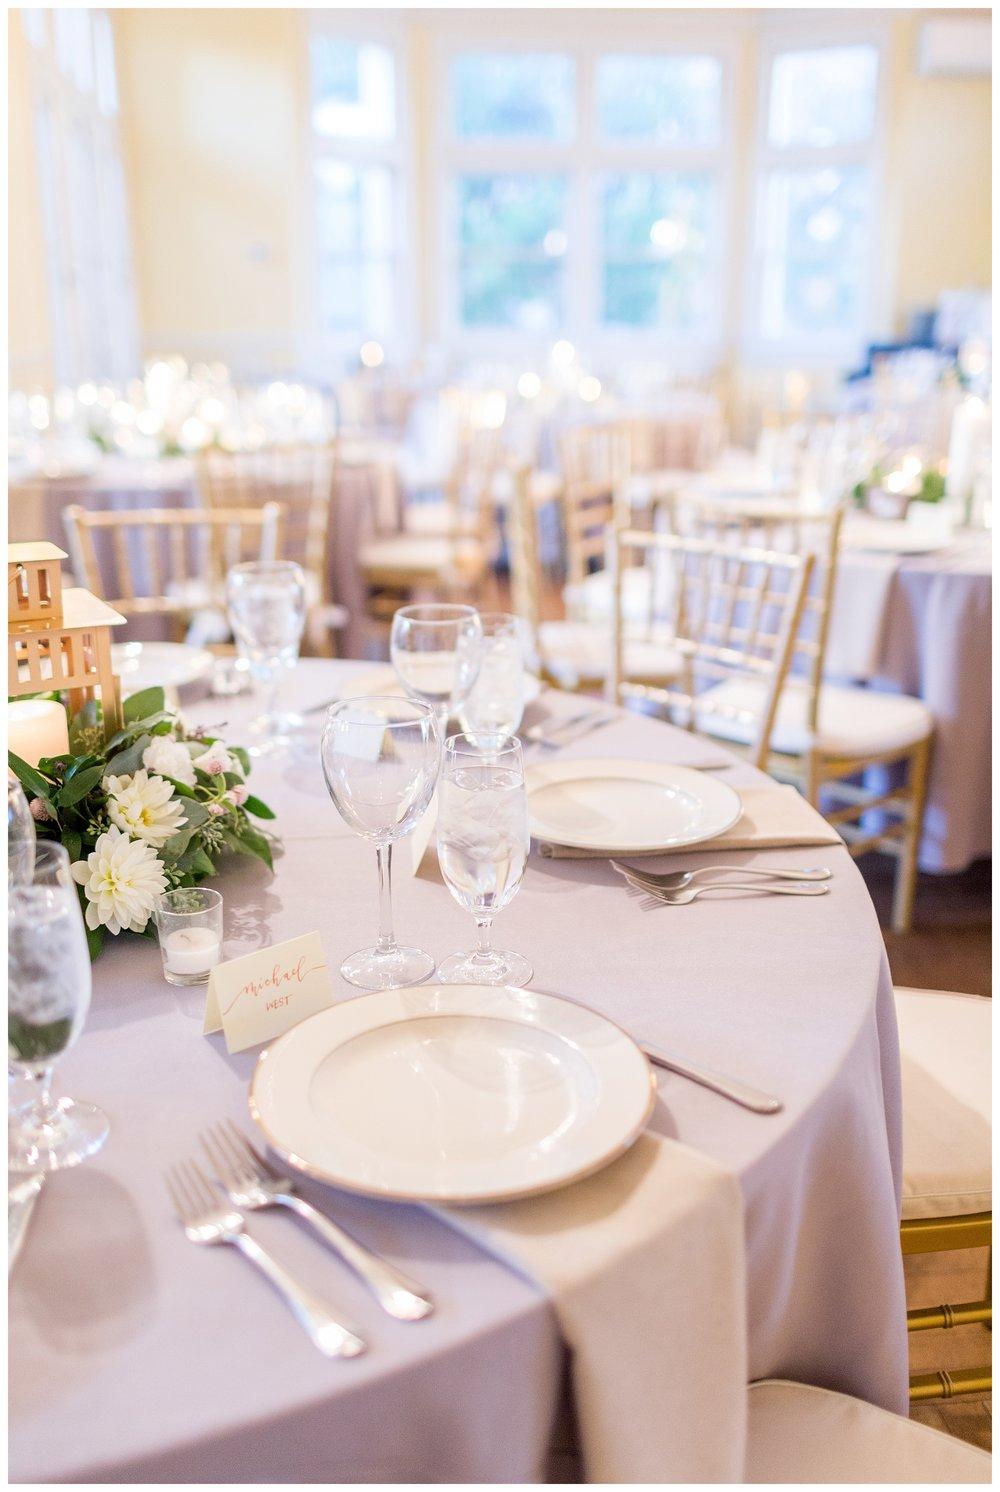 Meridian Hill Park Wedding | Washington DC Wedding Photographer Kir Tuben_0100.jpg